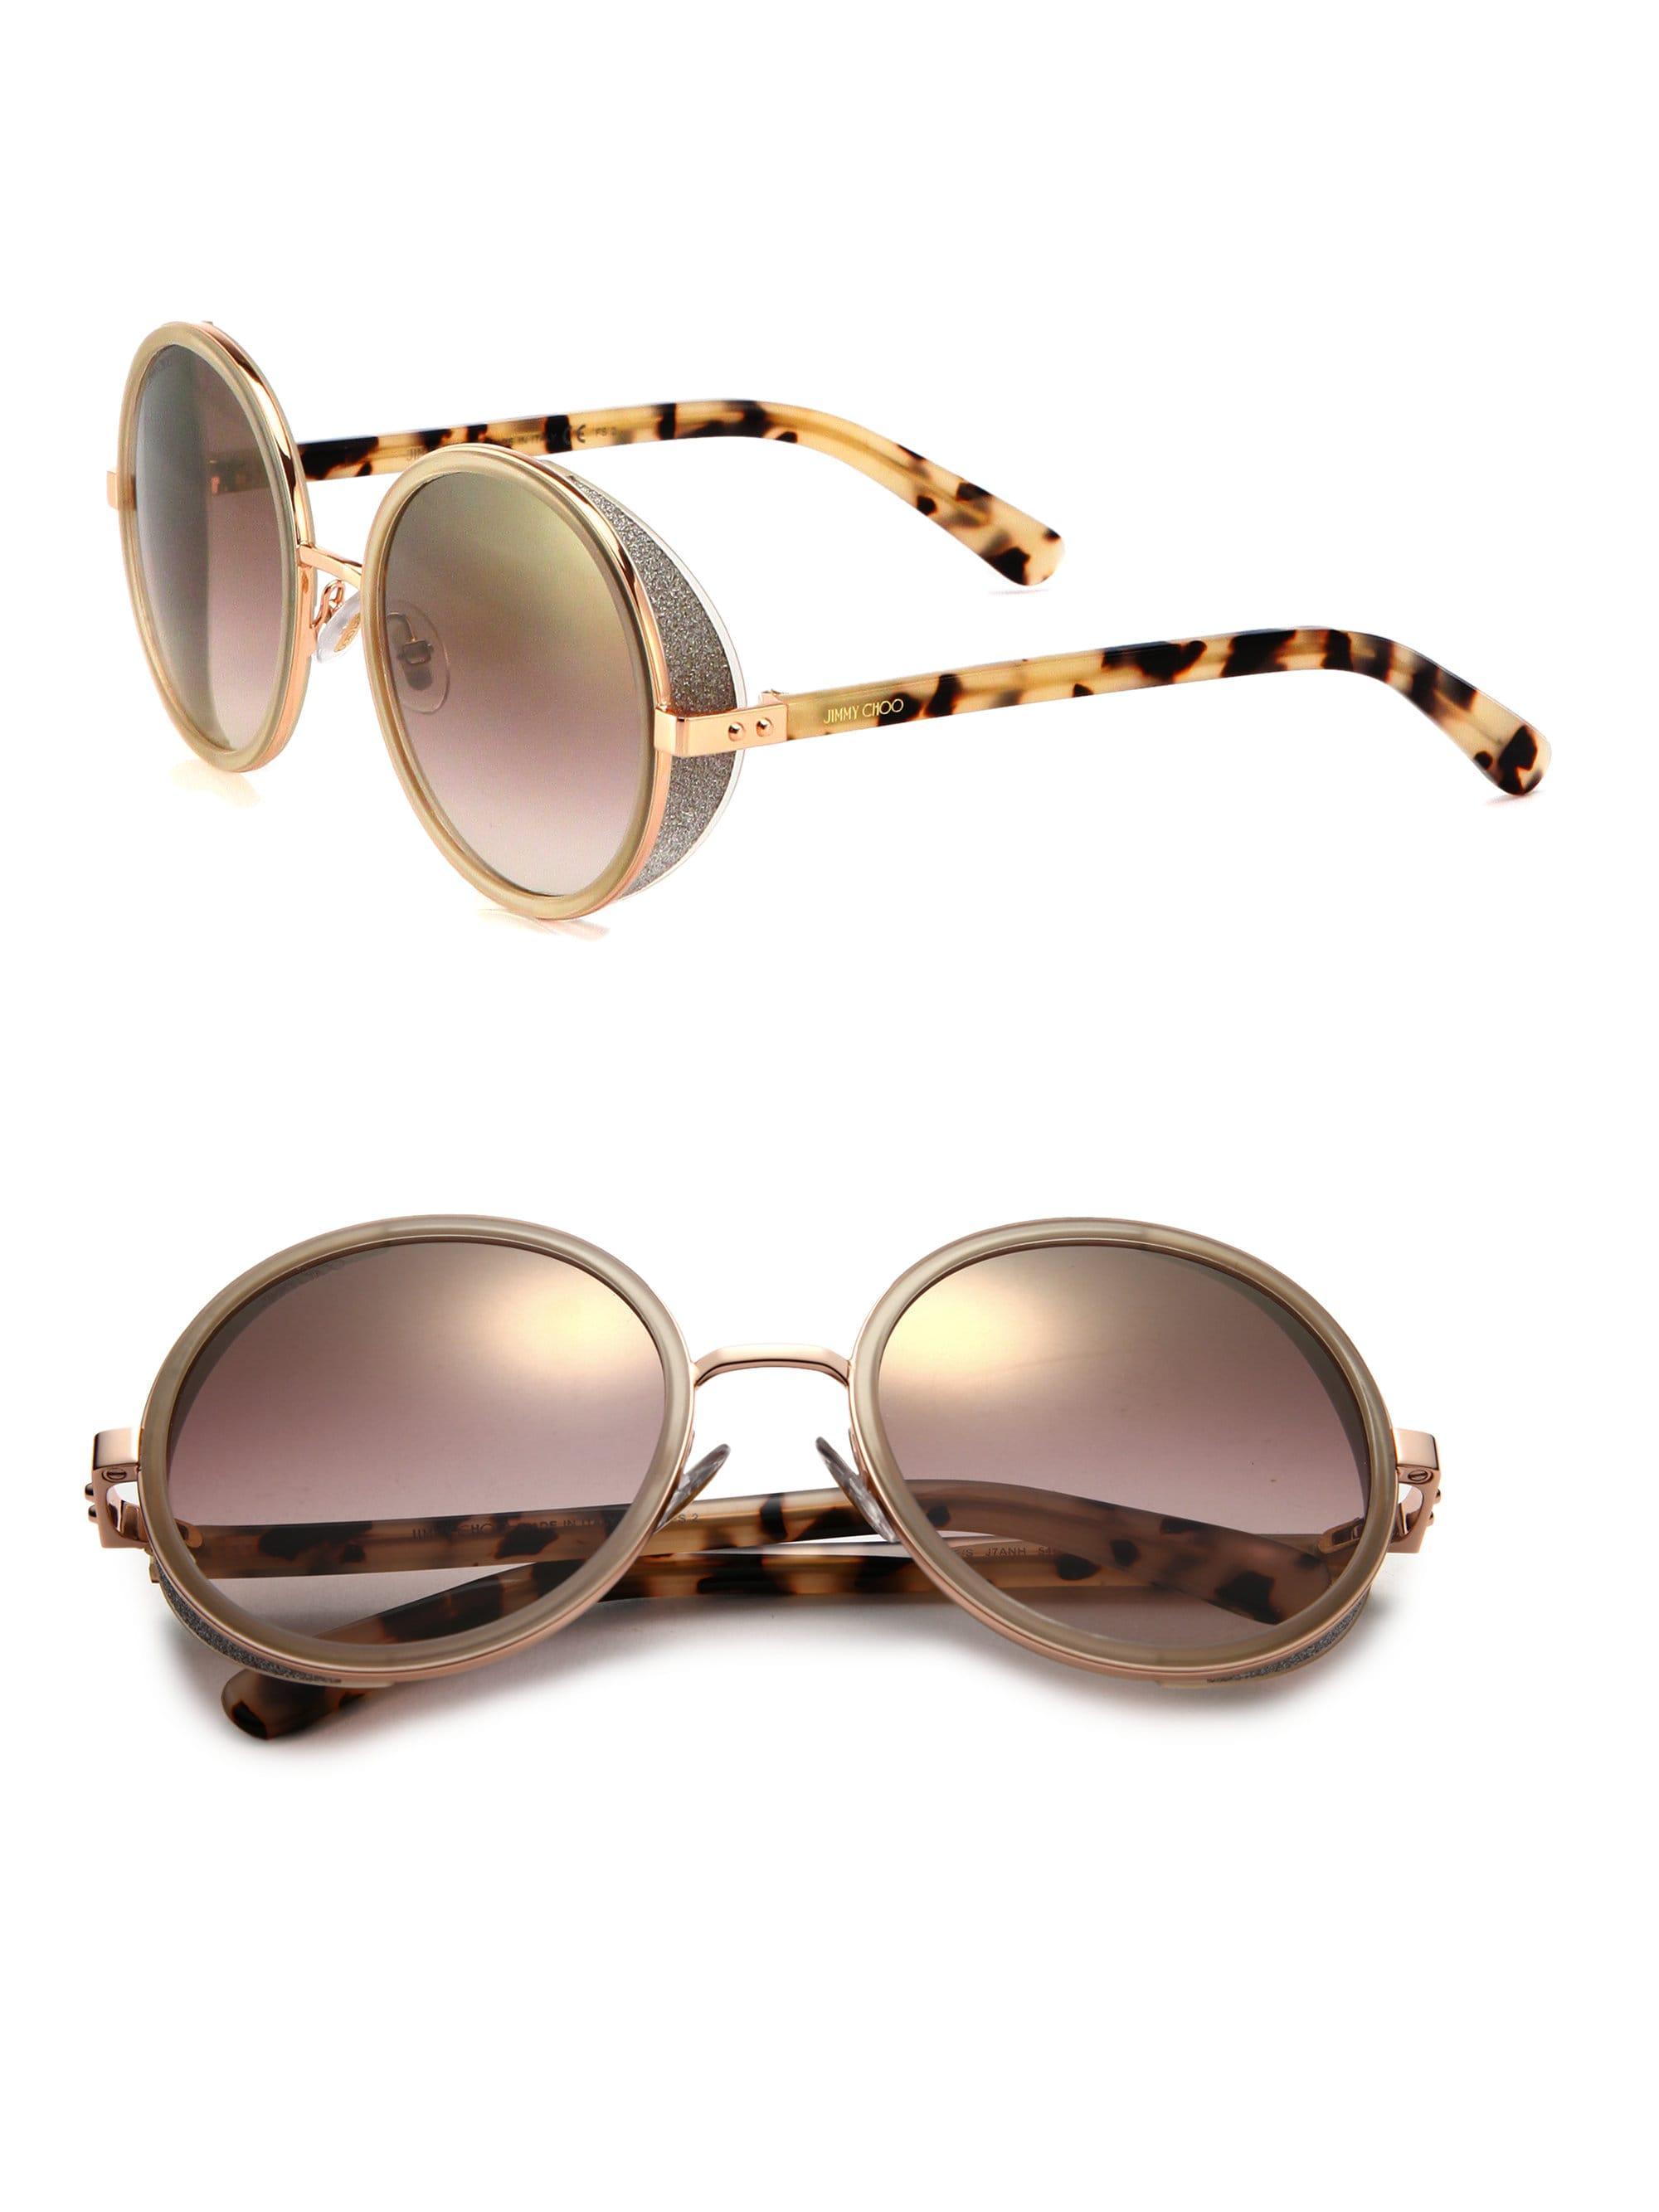 36da3560083 Jimmy Choo - Metallic Women s 54mm Andie Glitter-trim Round Sunglasses -  Gold Tortoise -. View fullscreen